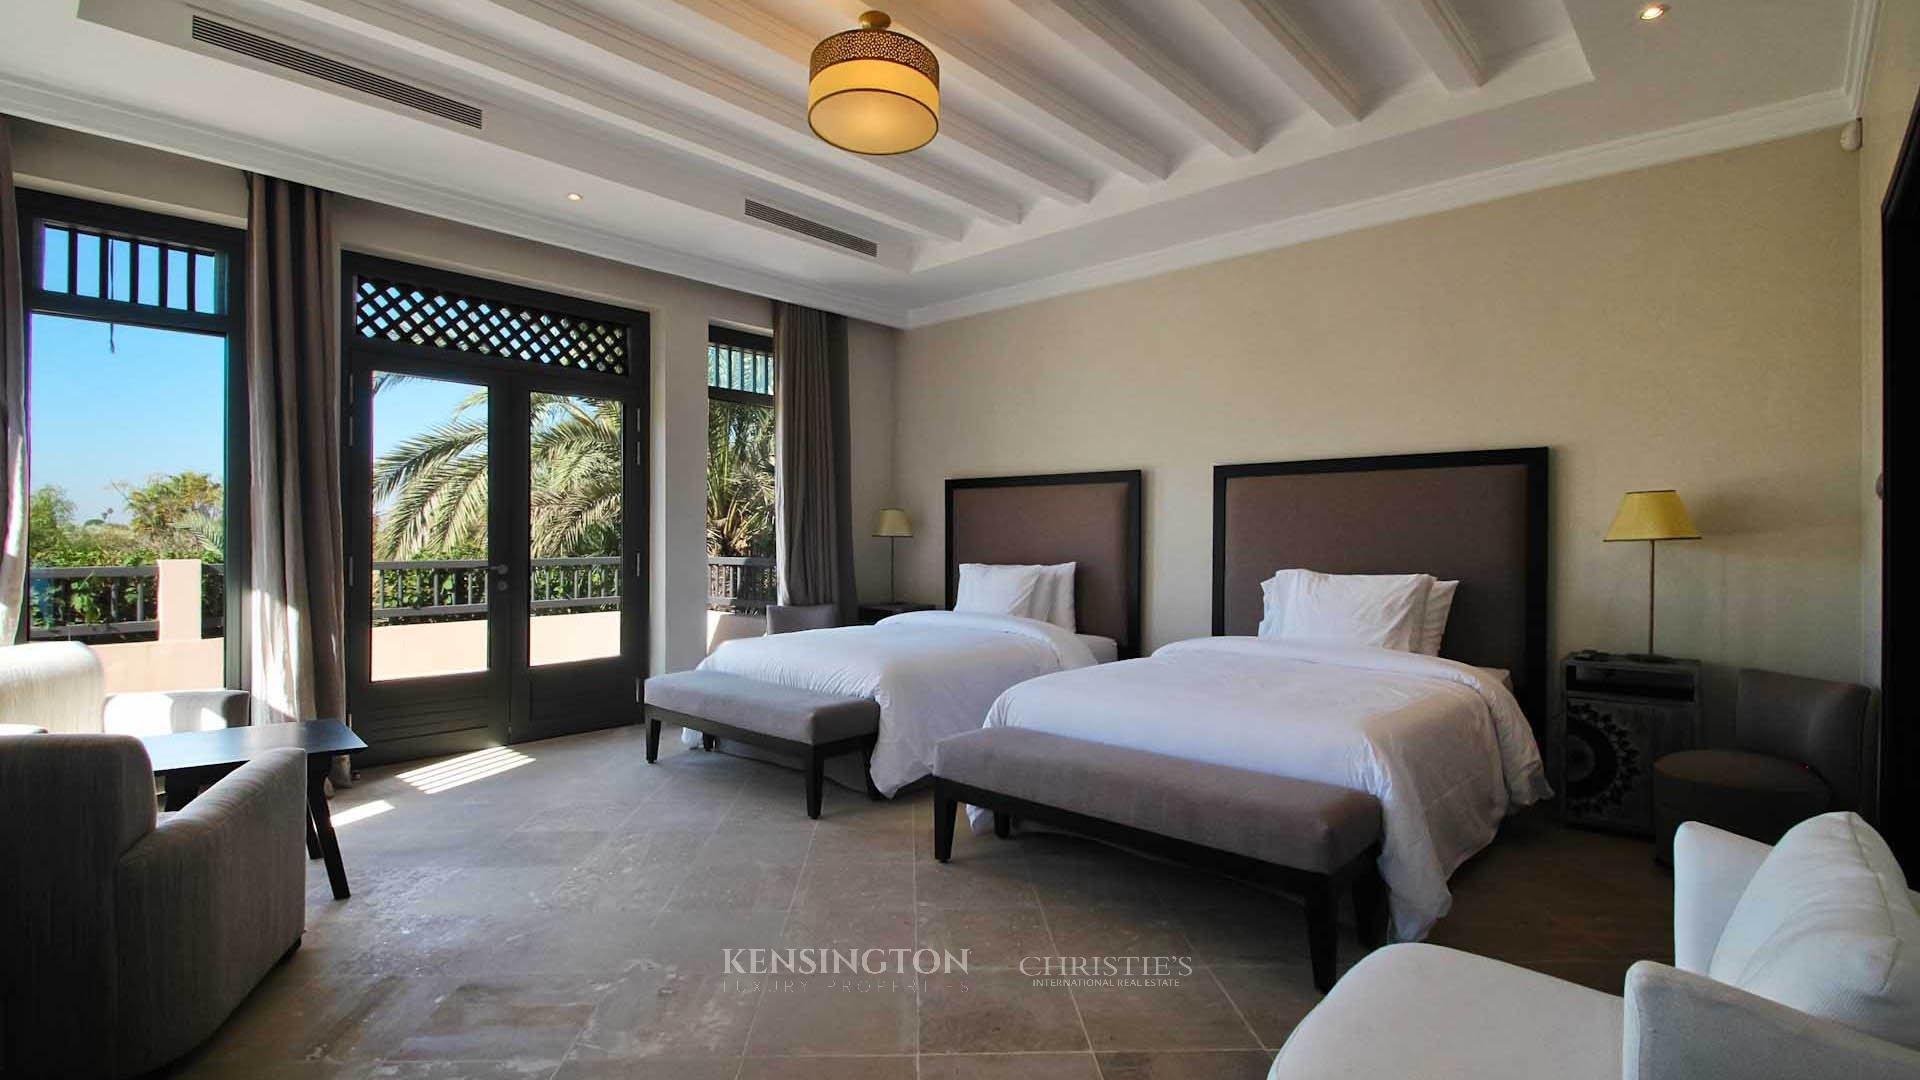 KPPM01112: Villa Aster Luxury Villa Marrakech Morocco